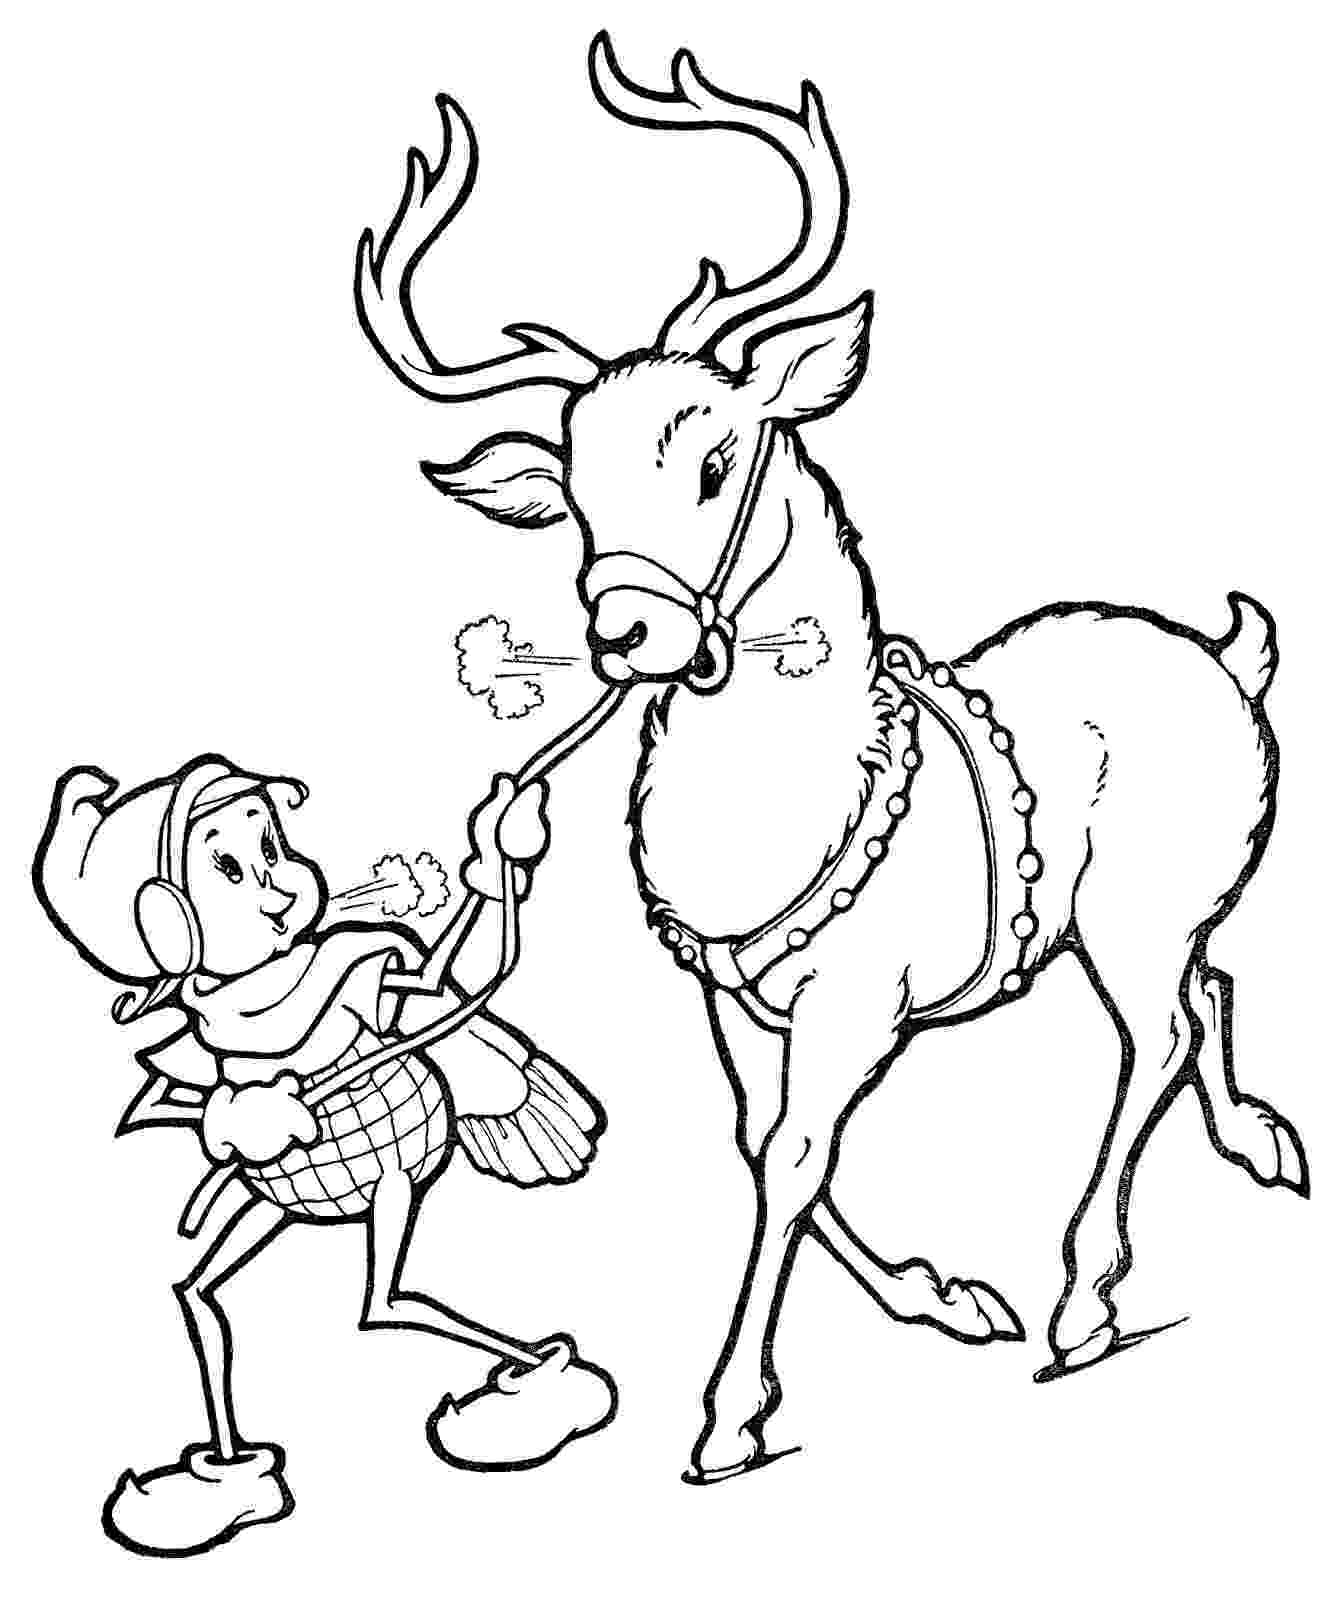 raindeer sketch christmas line art elf with reindeer the graphics fairy sketch raindeer